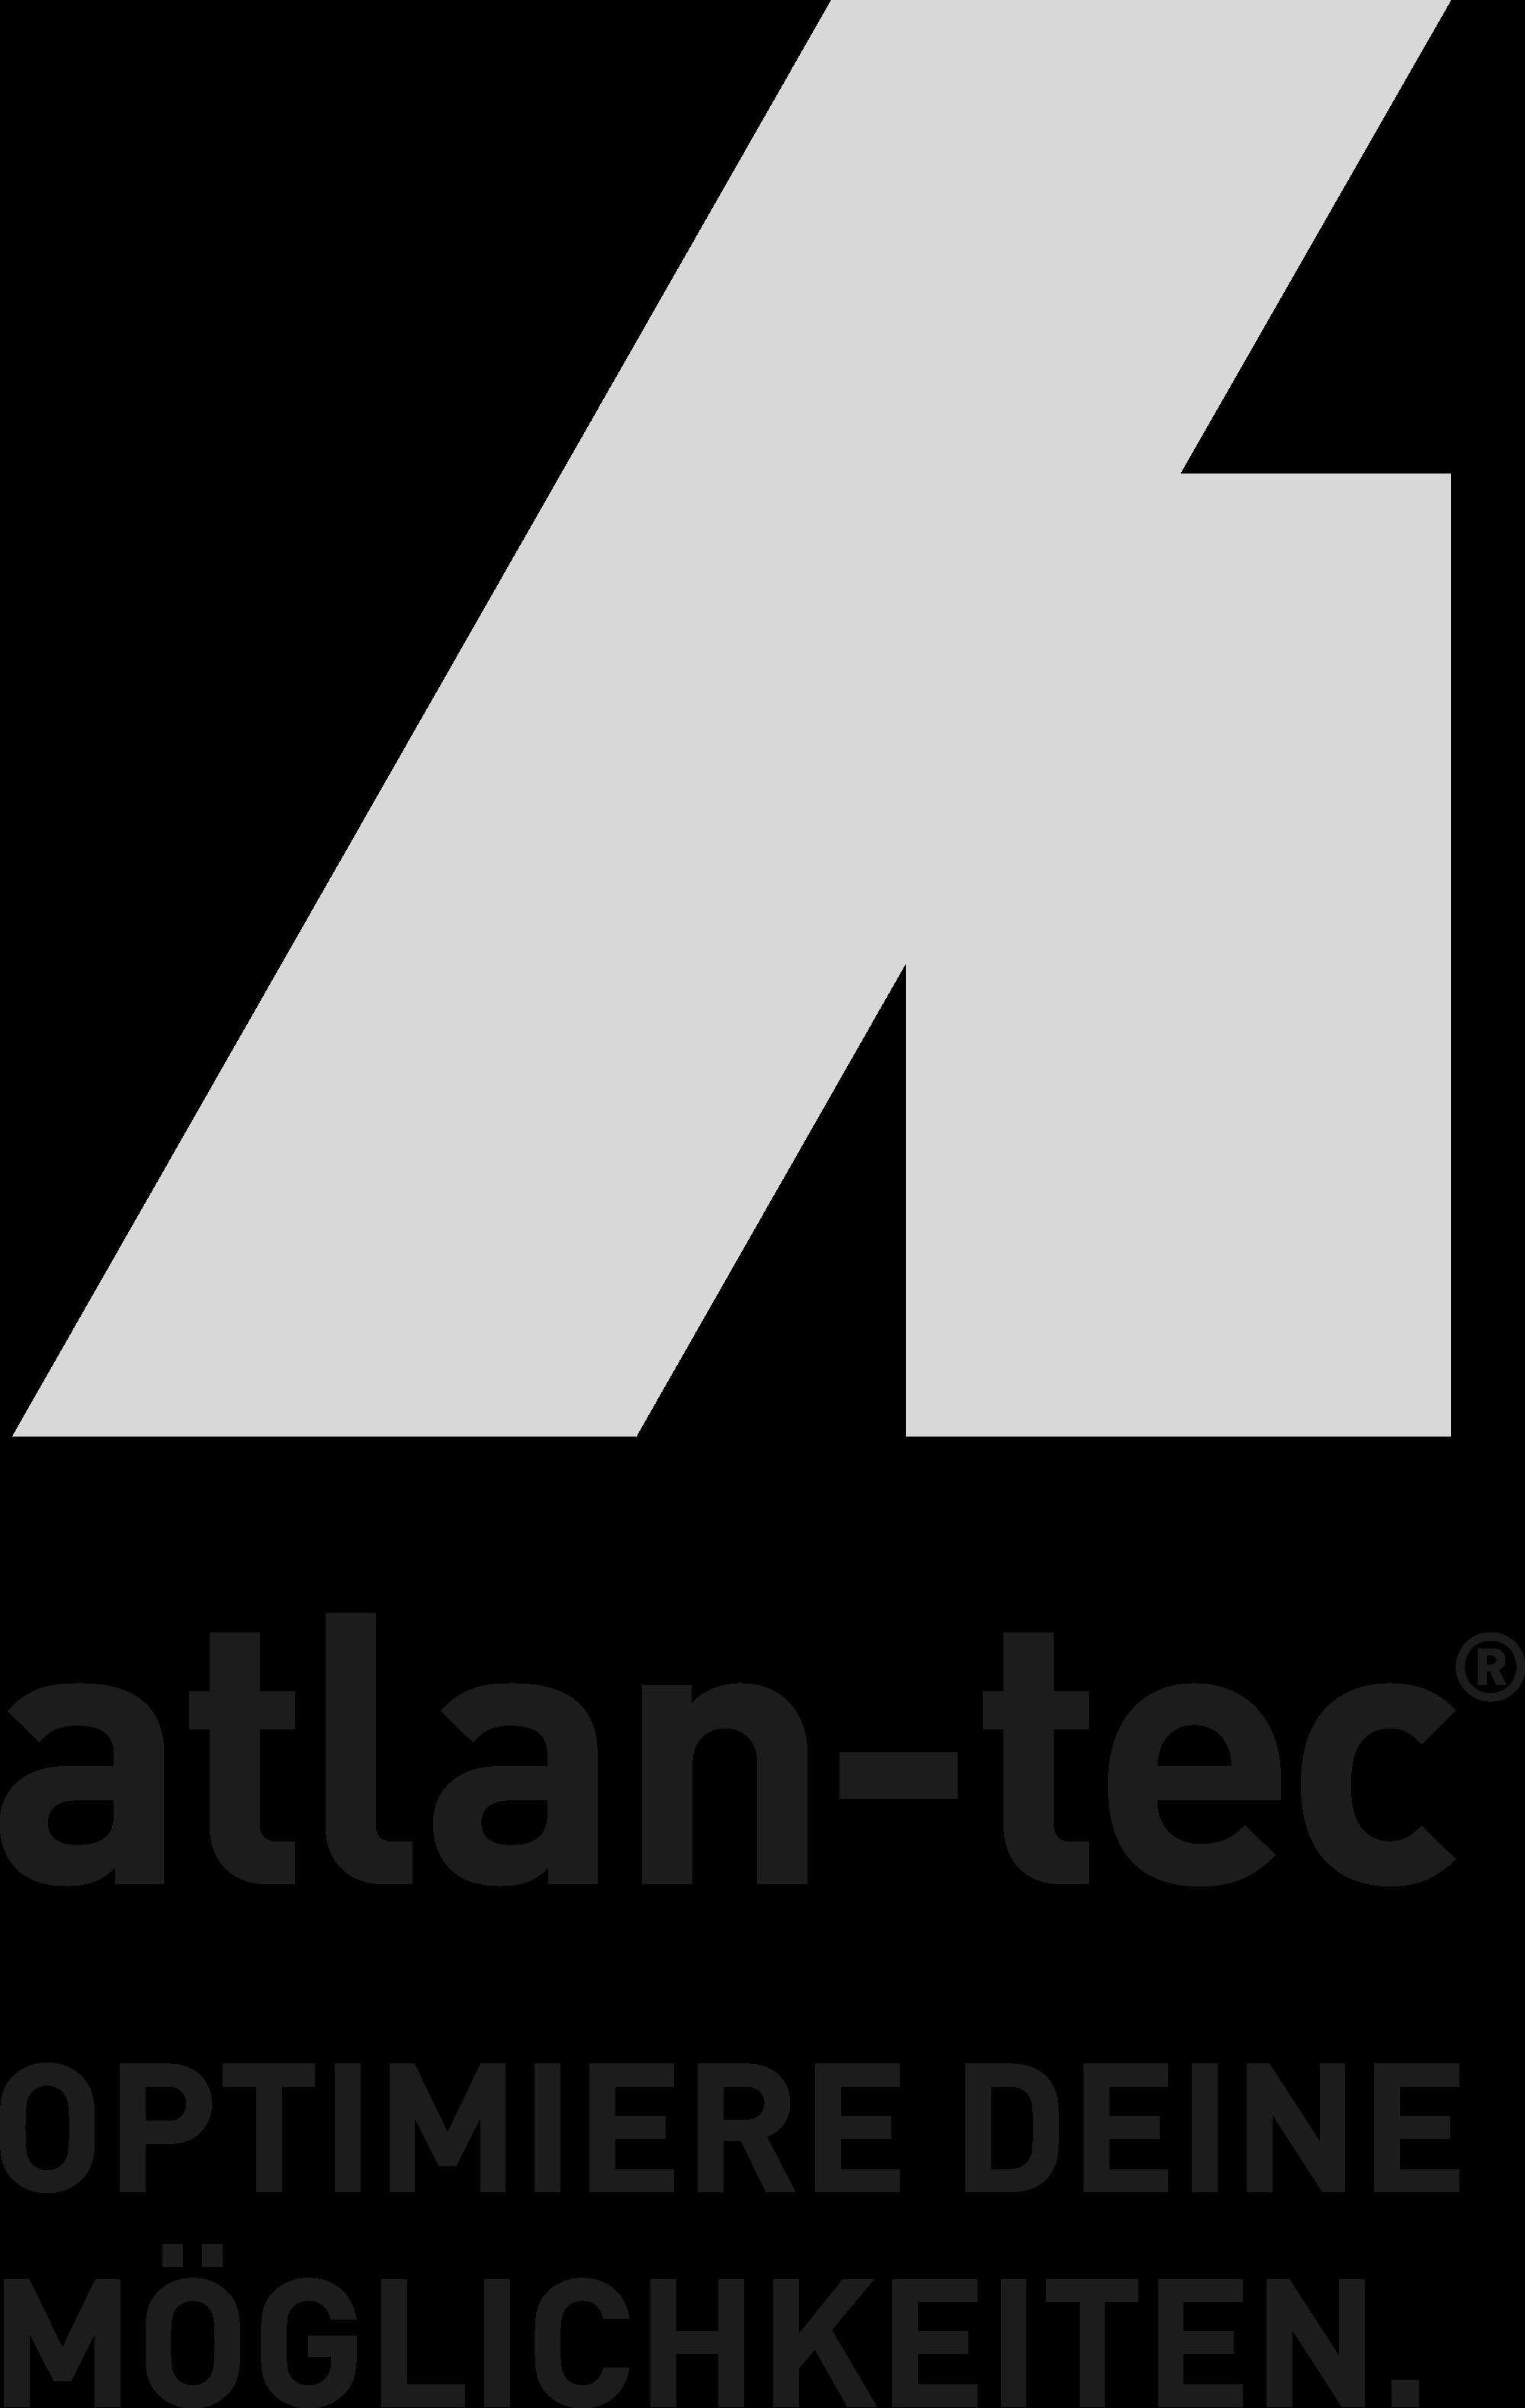 atlan-tec Systems GmbH